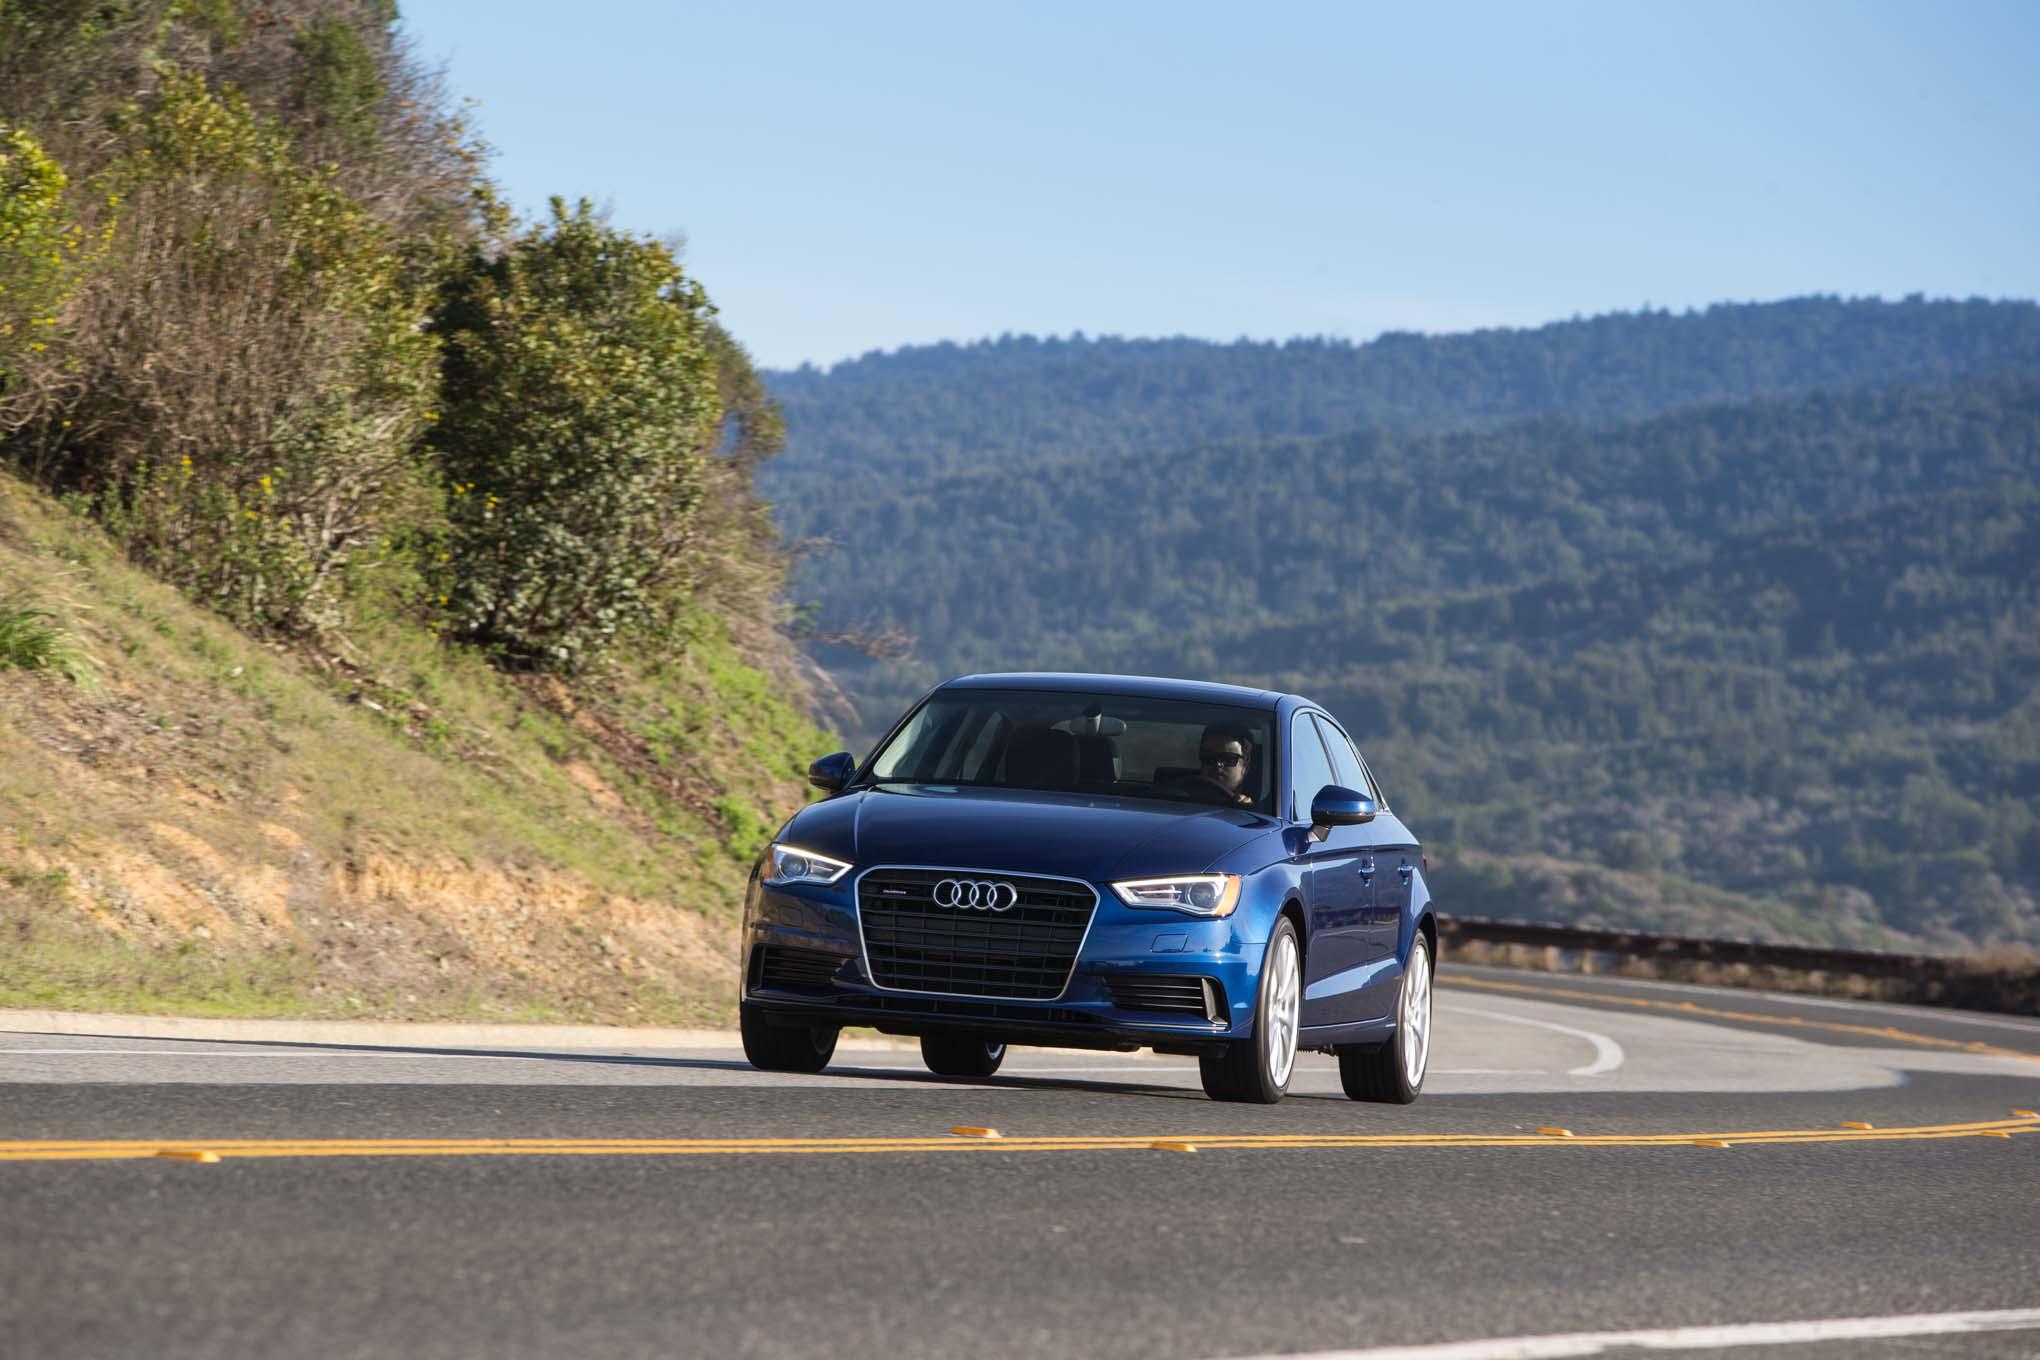 2015 audi a3 review automobile magazine those altavistaventures Gallery